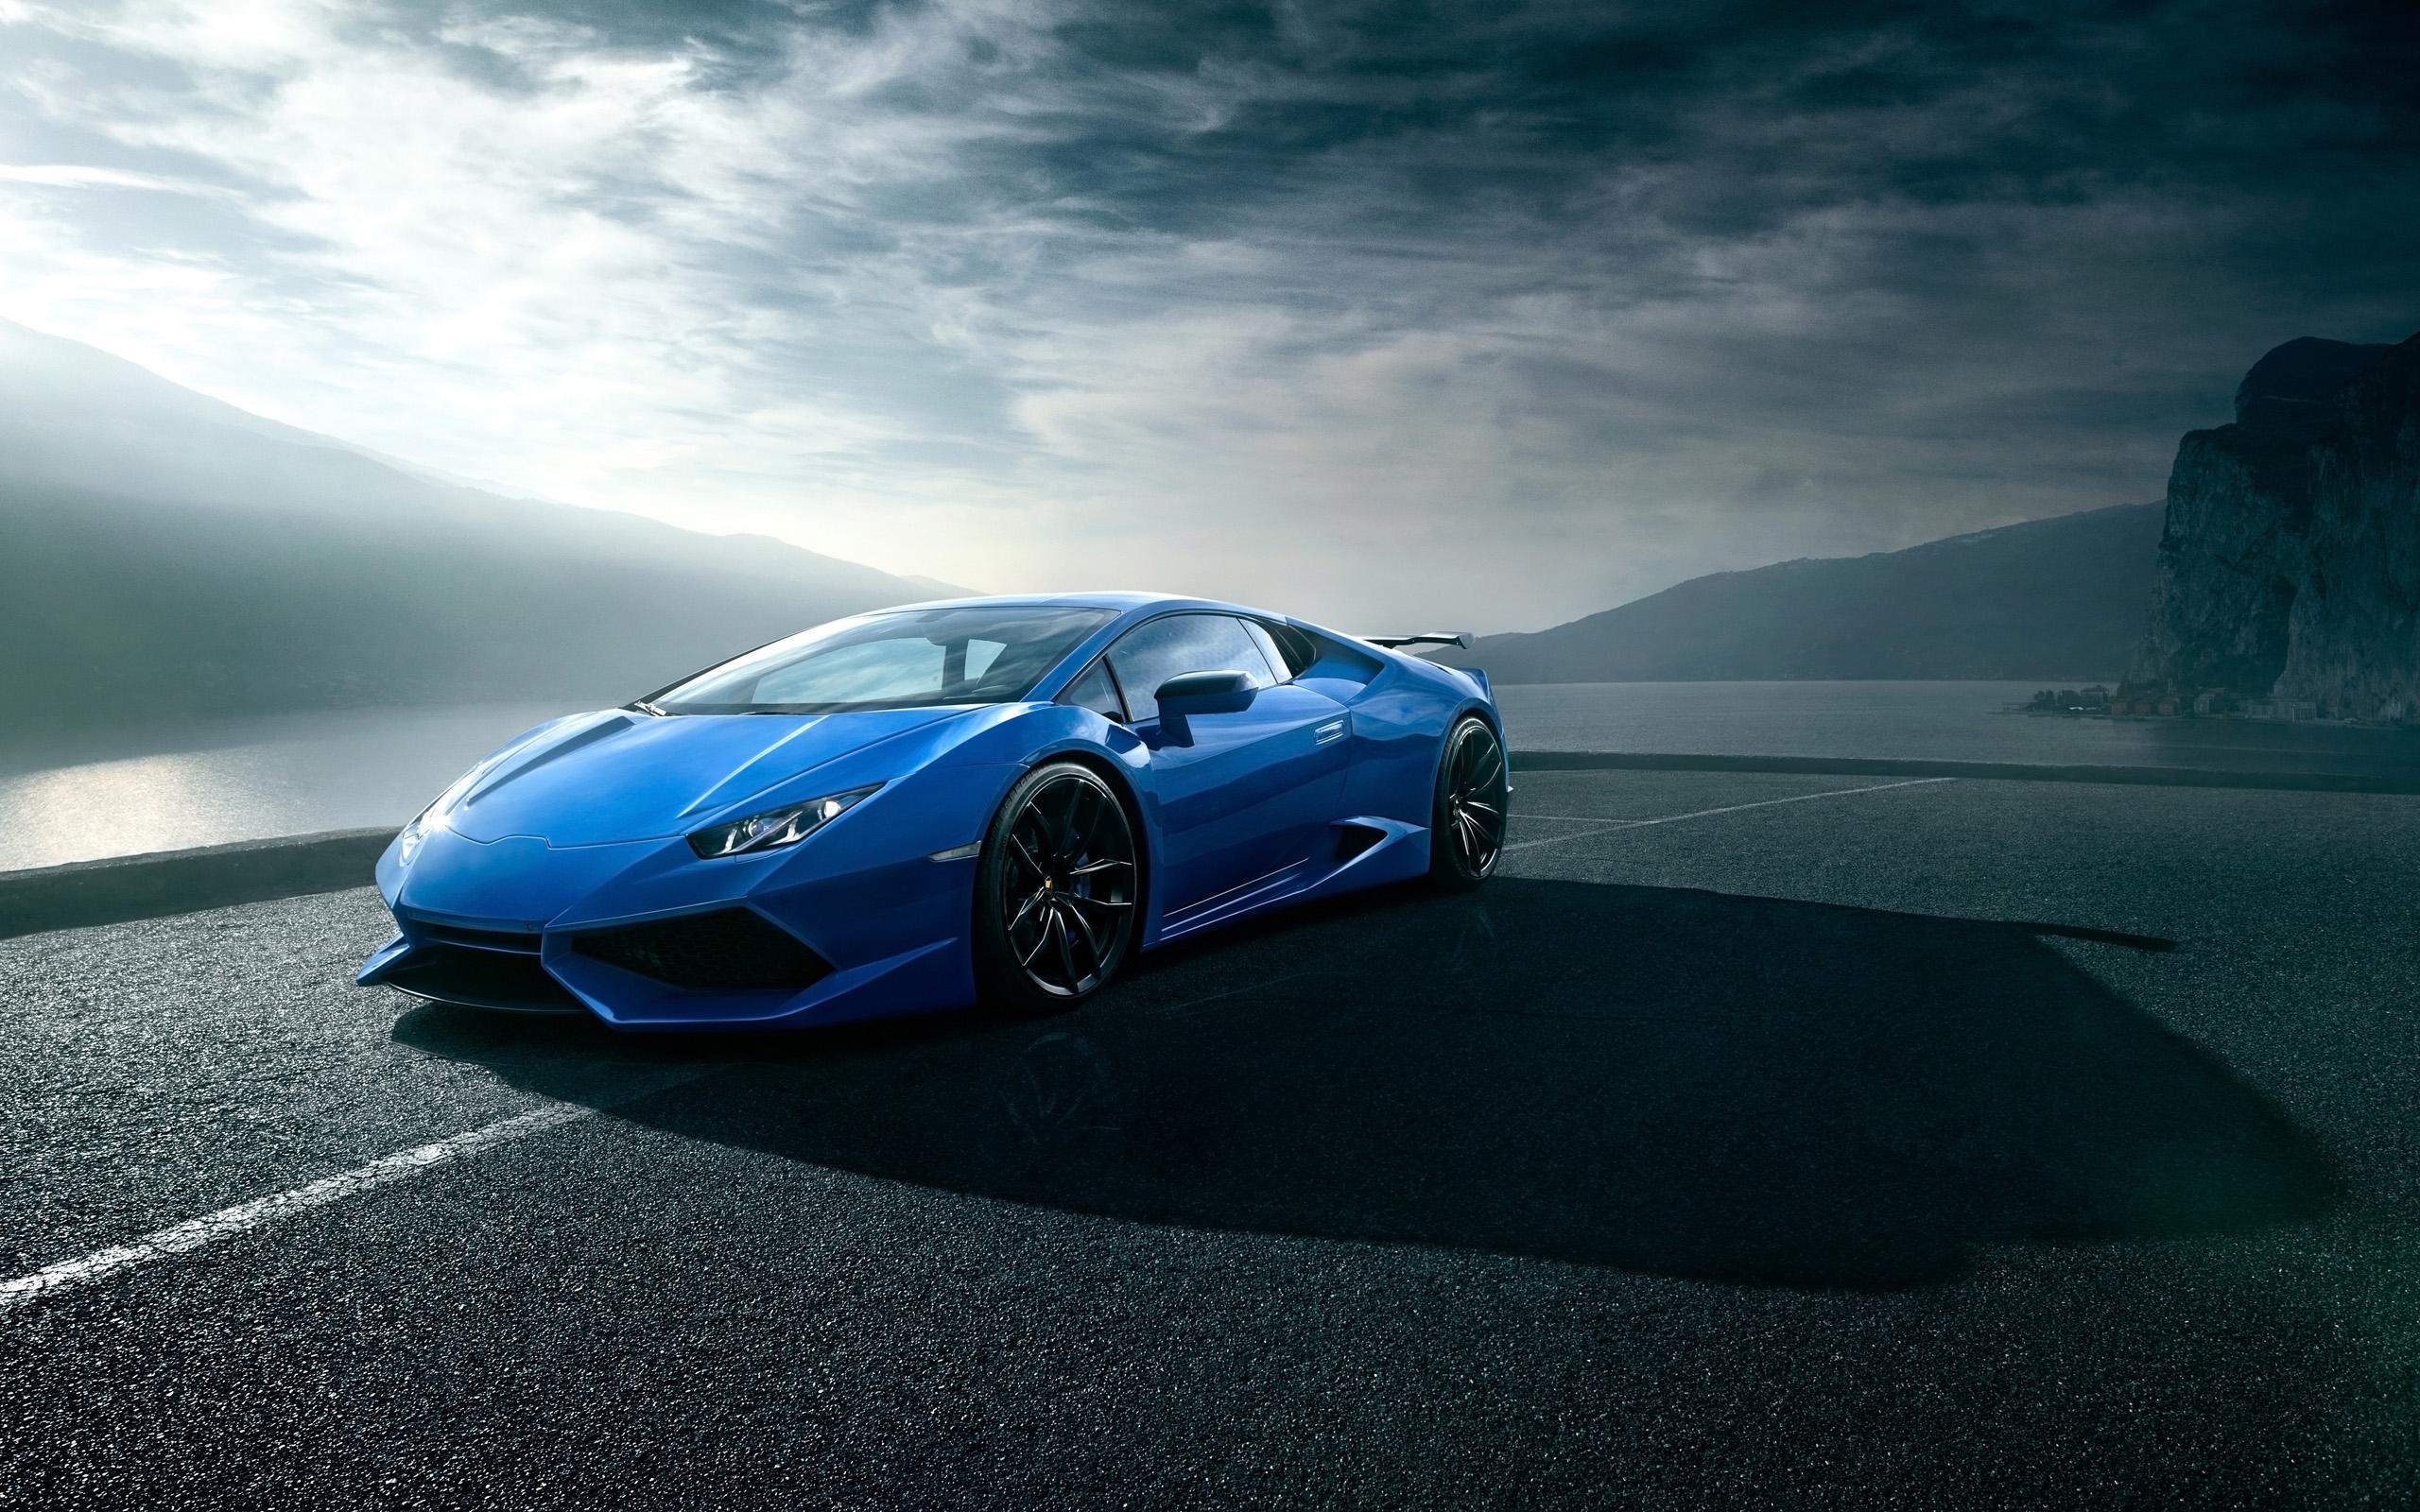 Lamborghini Novitec Torado Wallpaper 3   2560 X 1600 stmednet 2560x1600